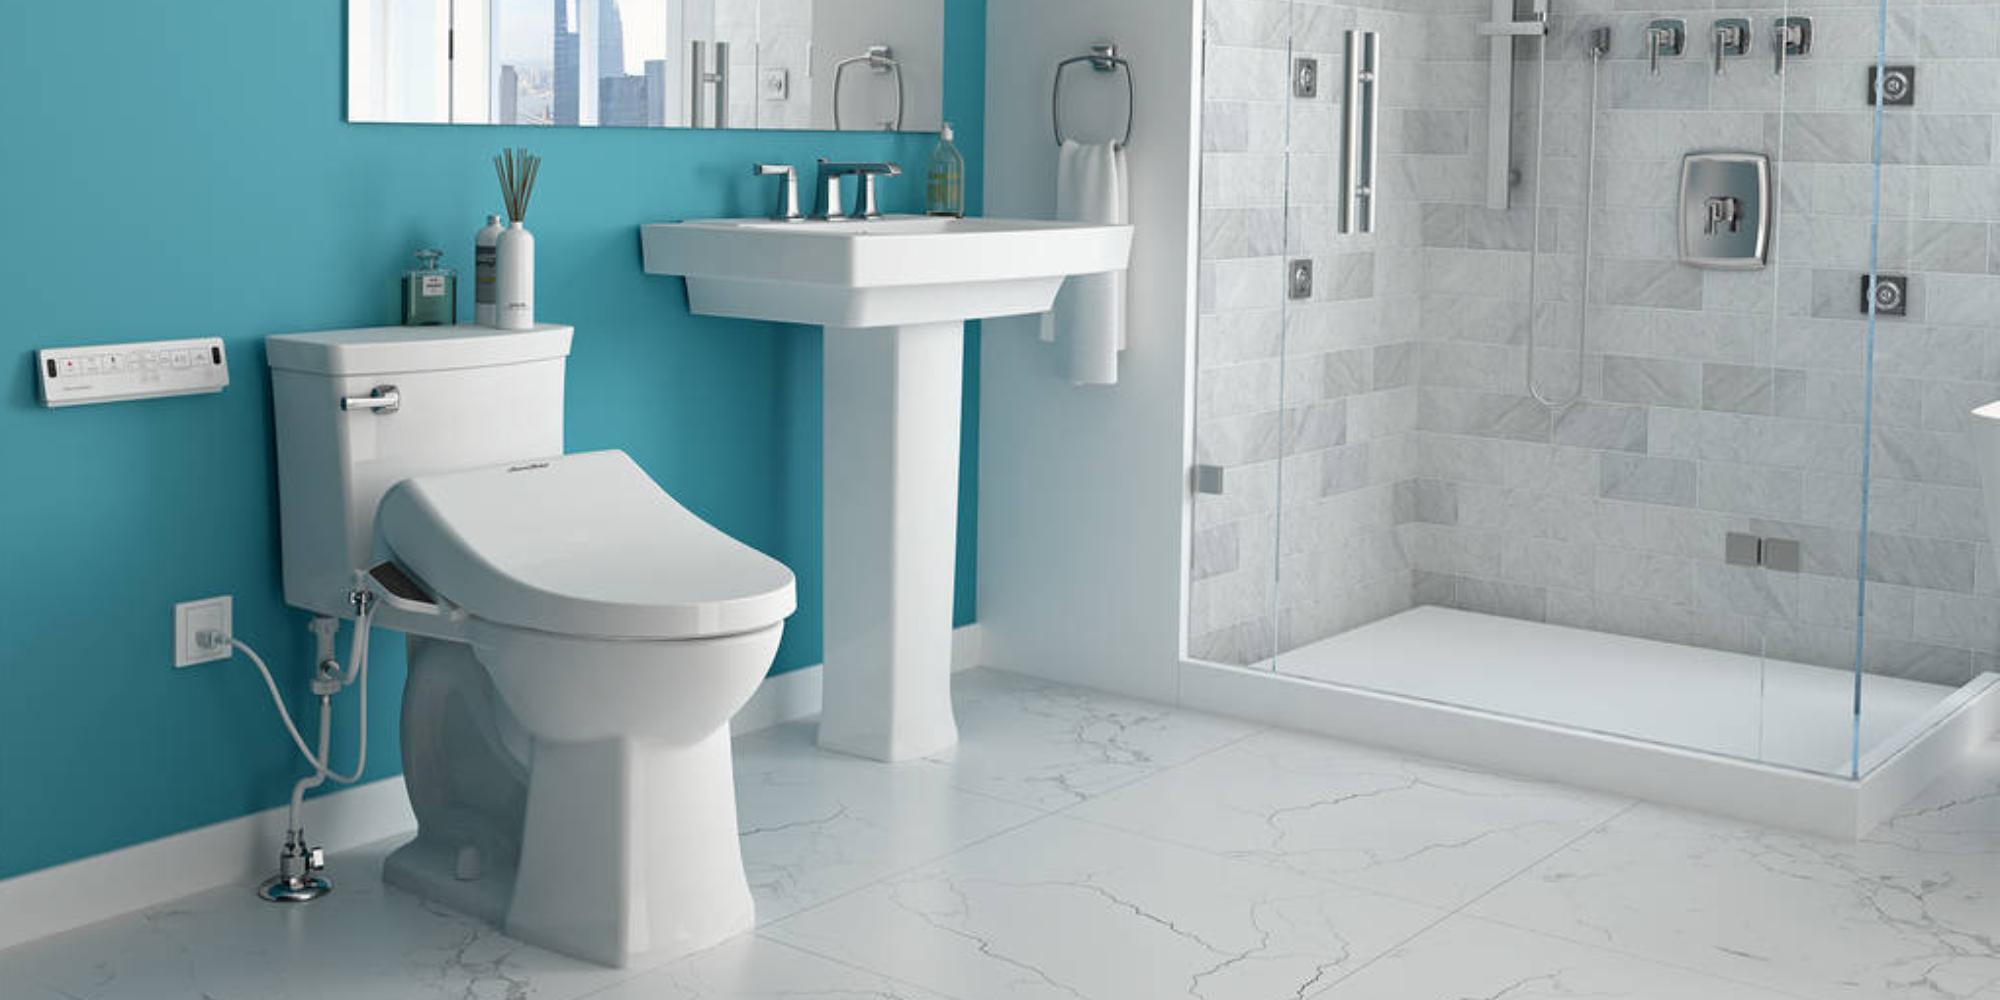 American Standard SpaLet Bidet Concept Bathroom